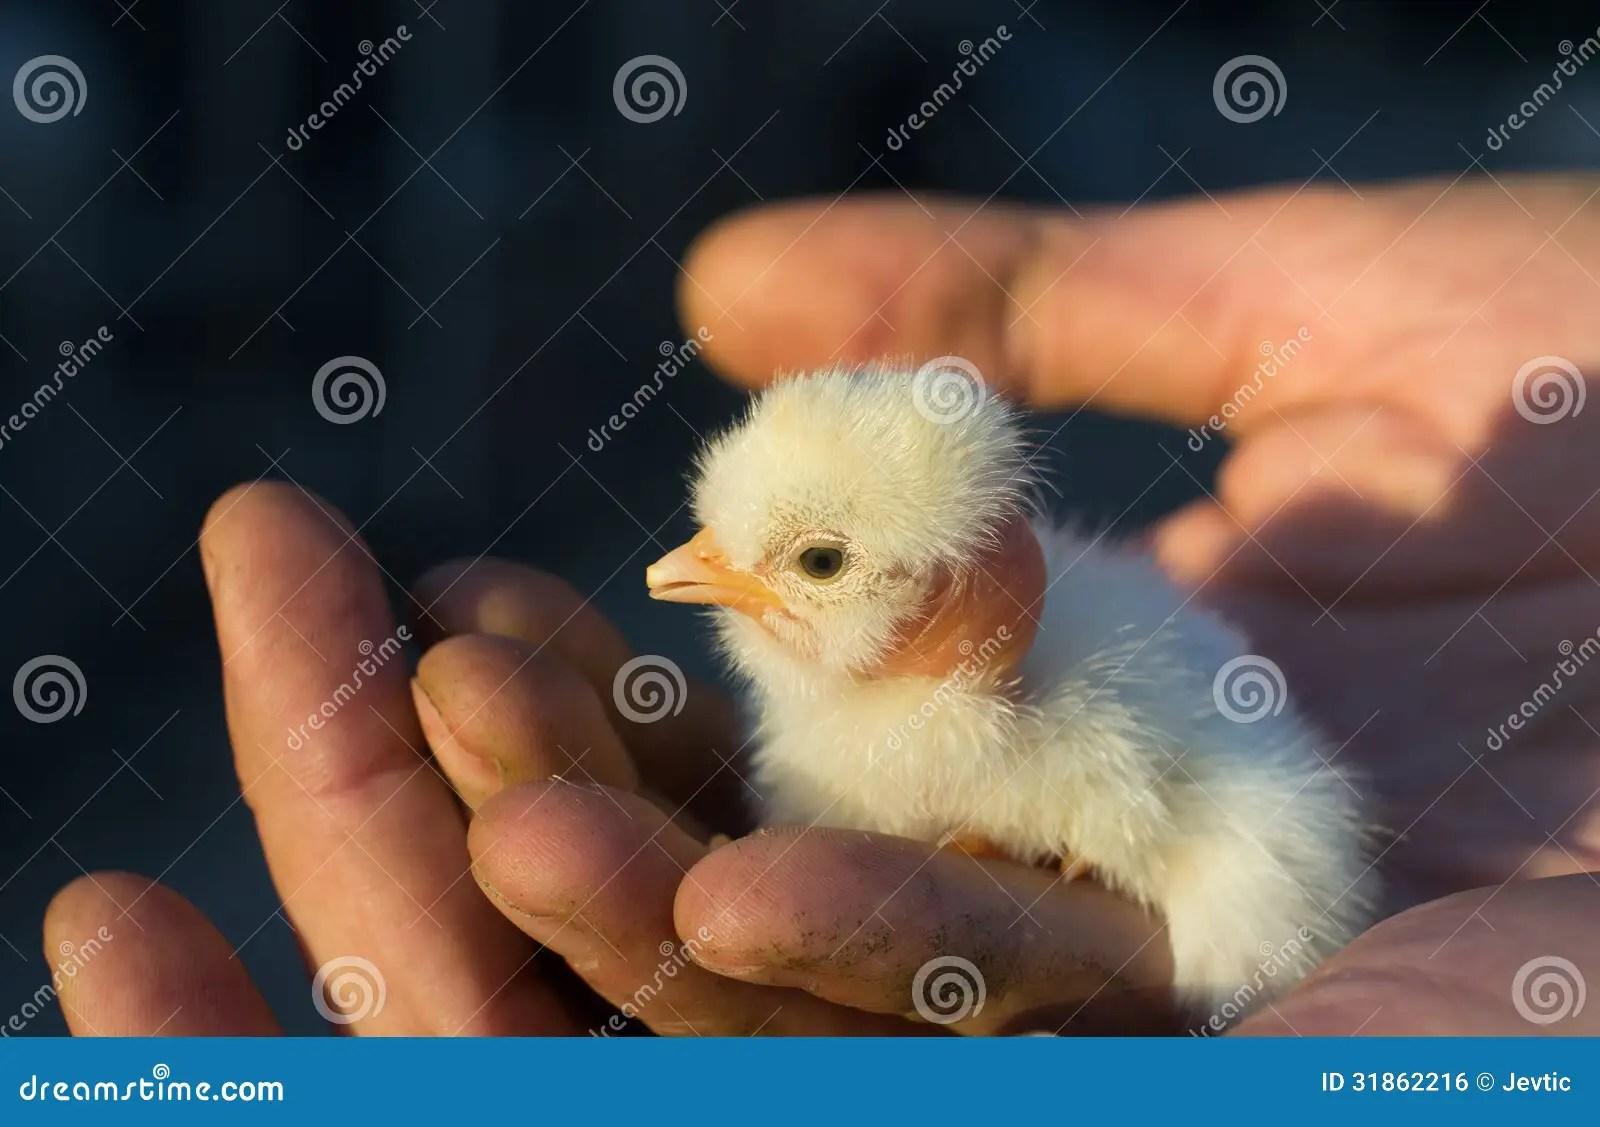 Cute Baby Turkey Royalty Free Stock Image Image 31862216